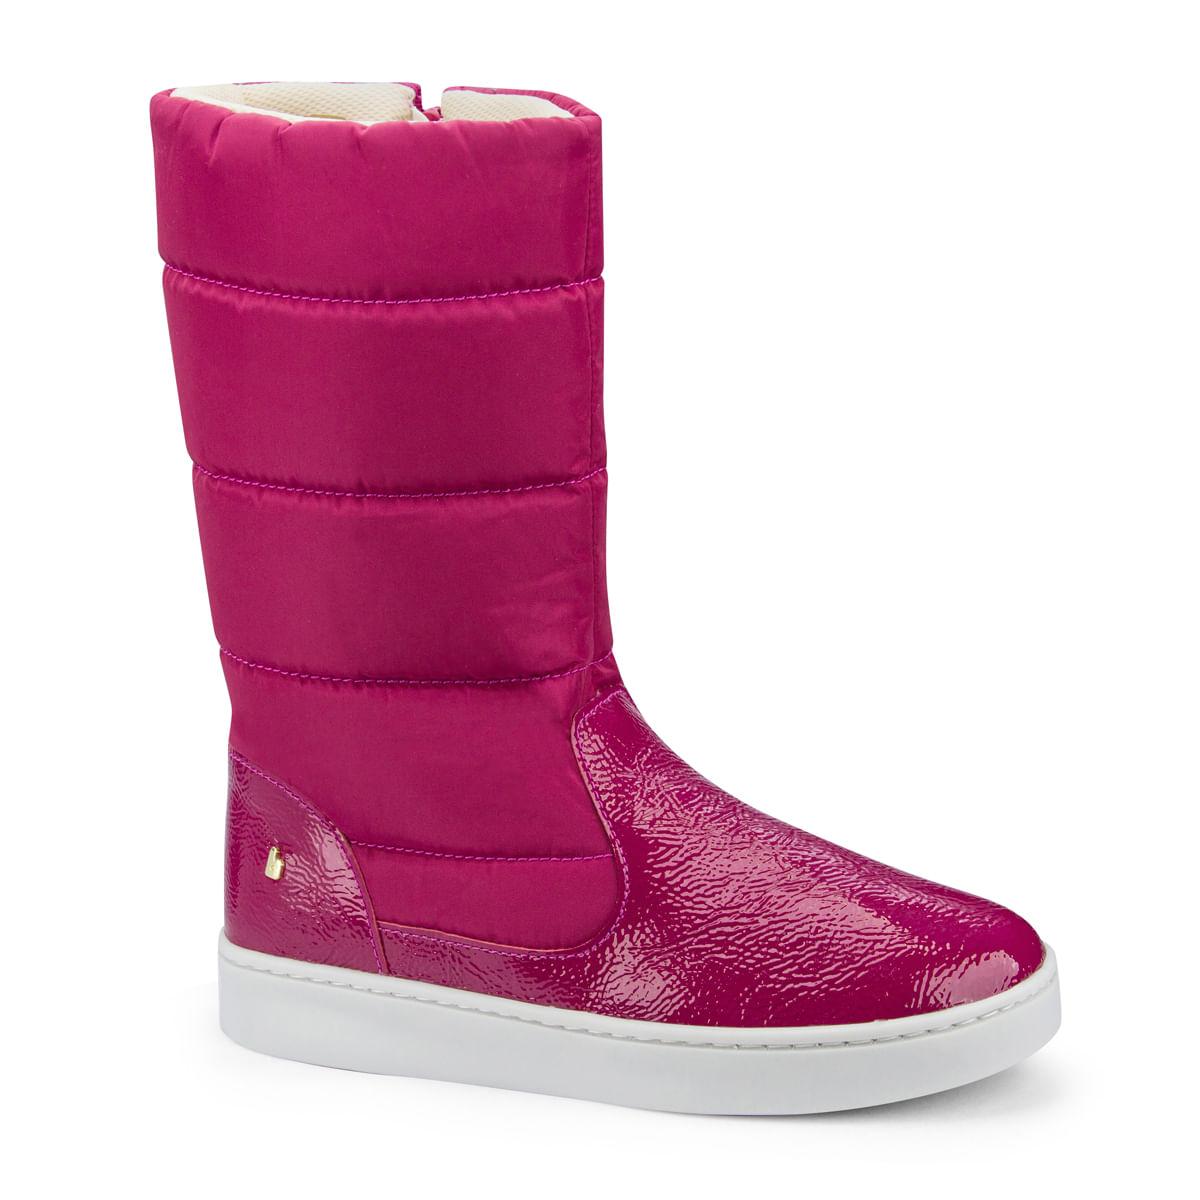 bb5e7d108dccf3 Bota Infantil Bibi Feminina Rosa Cano Alto Urban Boots